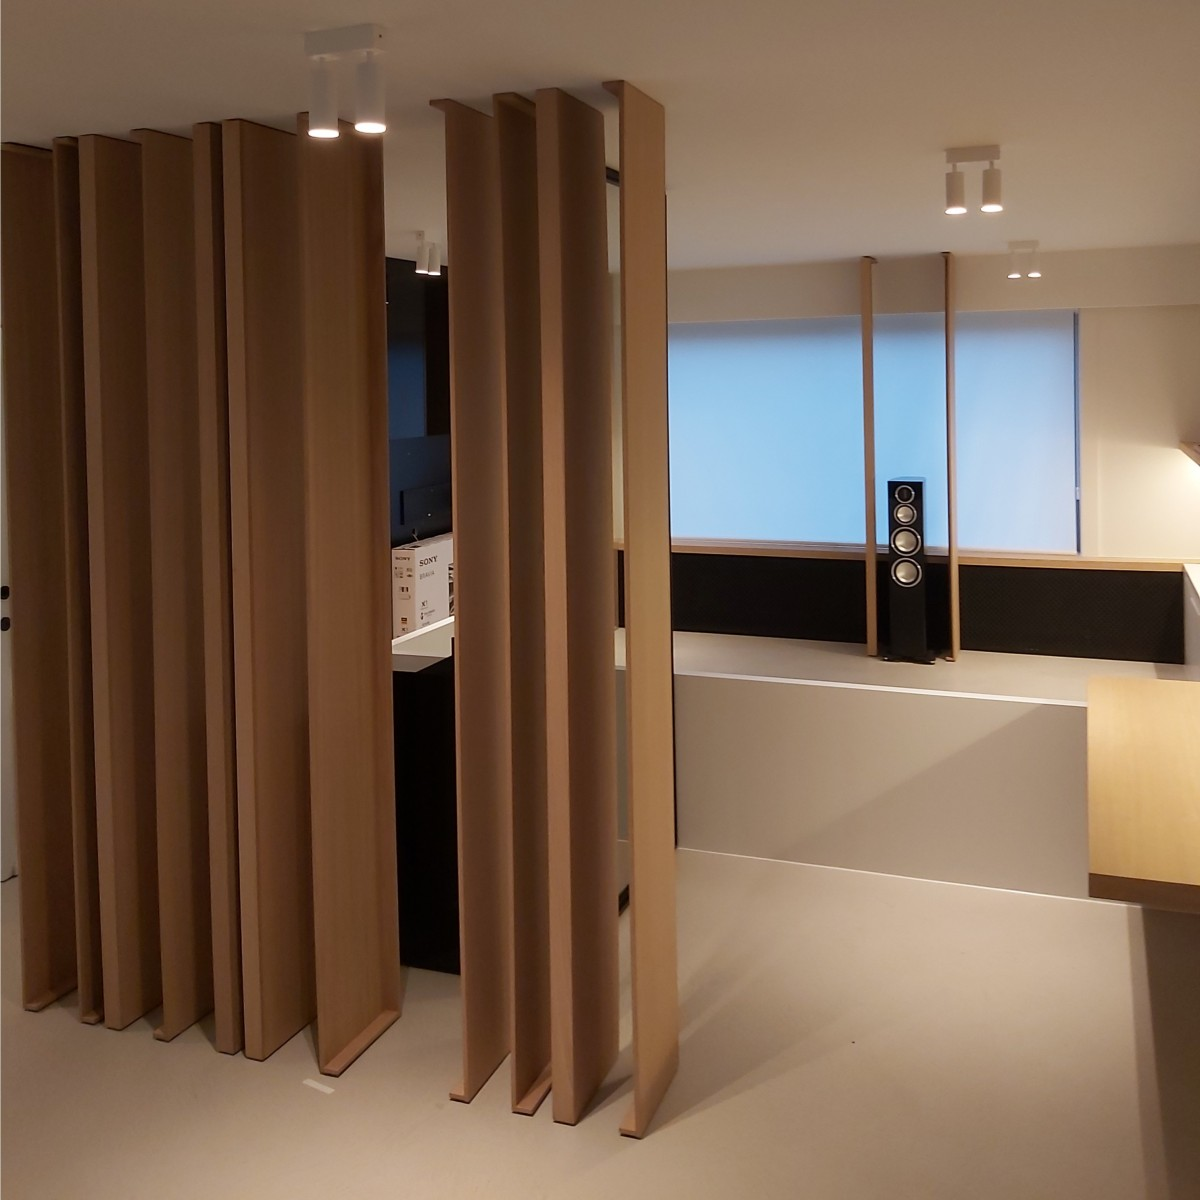 interieur-inrichting-1